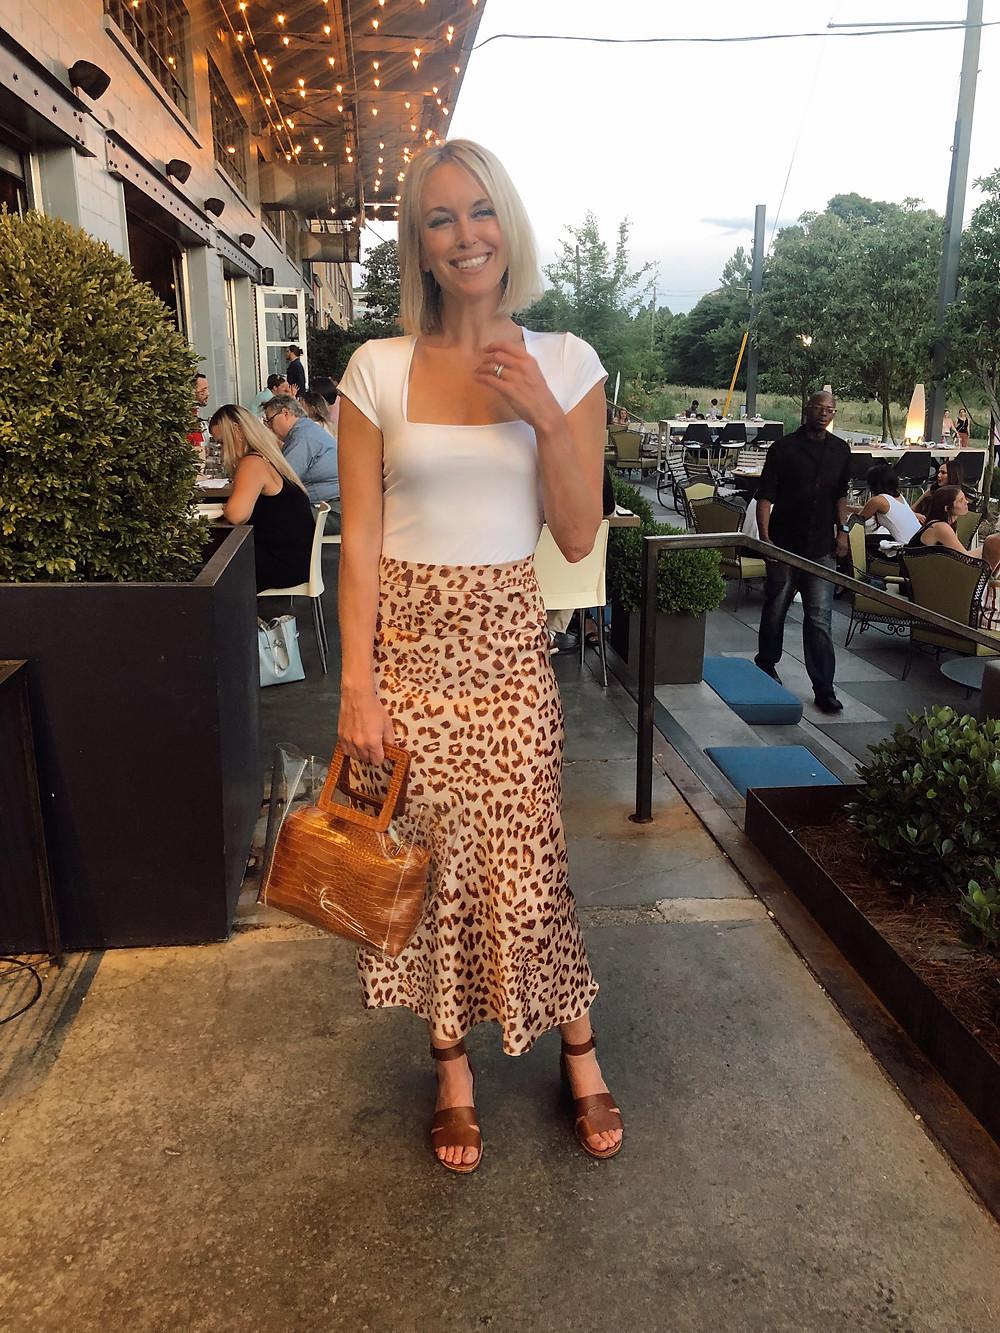 date night outfit, summer style, leopard midi skirt, free people bodysuit, pvc croc bag, atlanta two urban licks, fashion bloger style